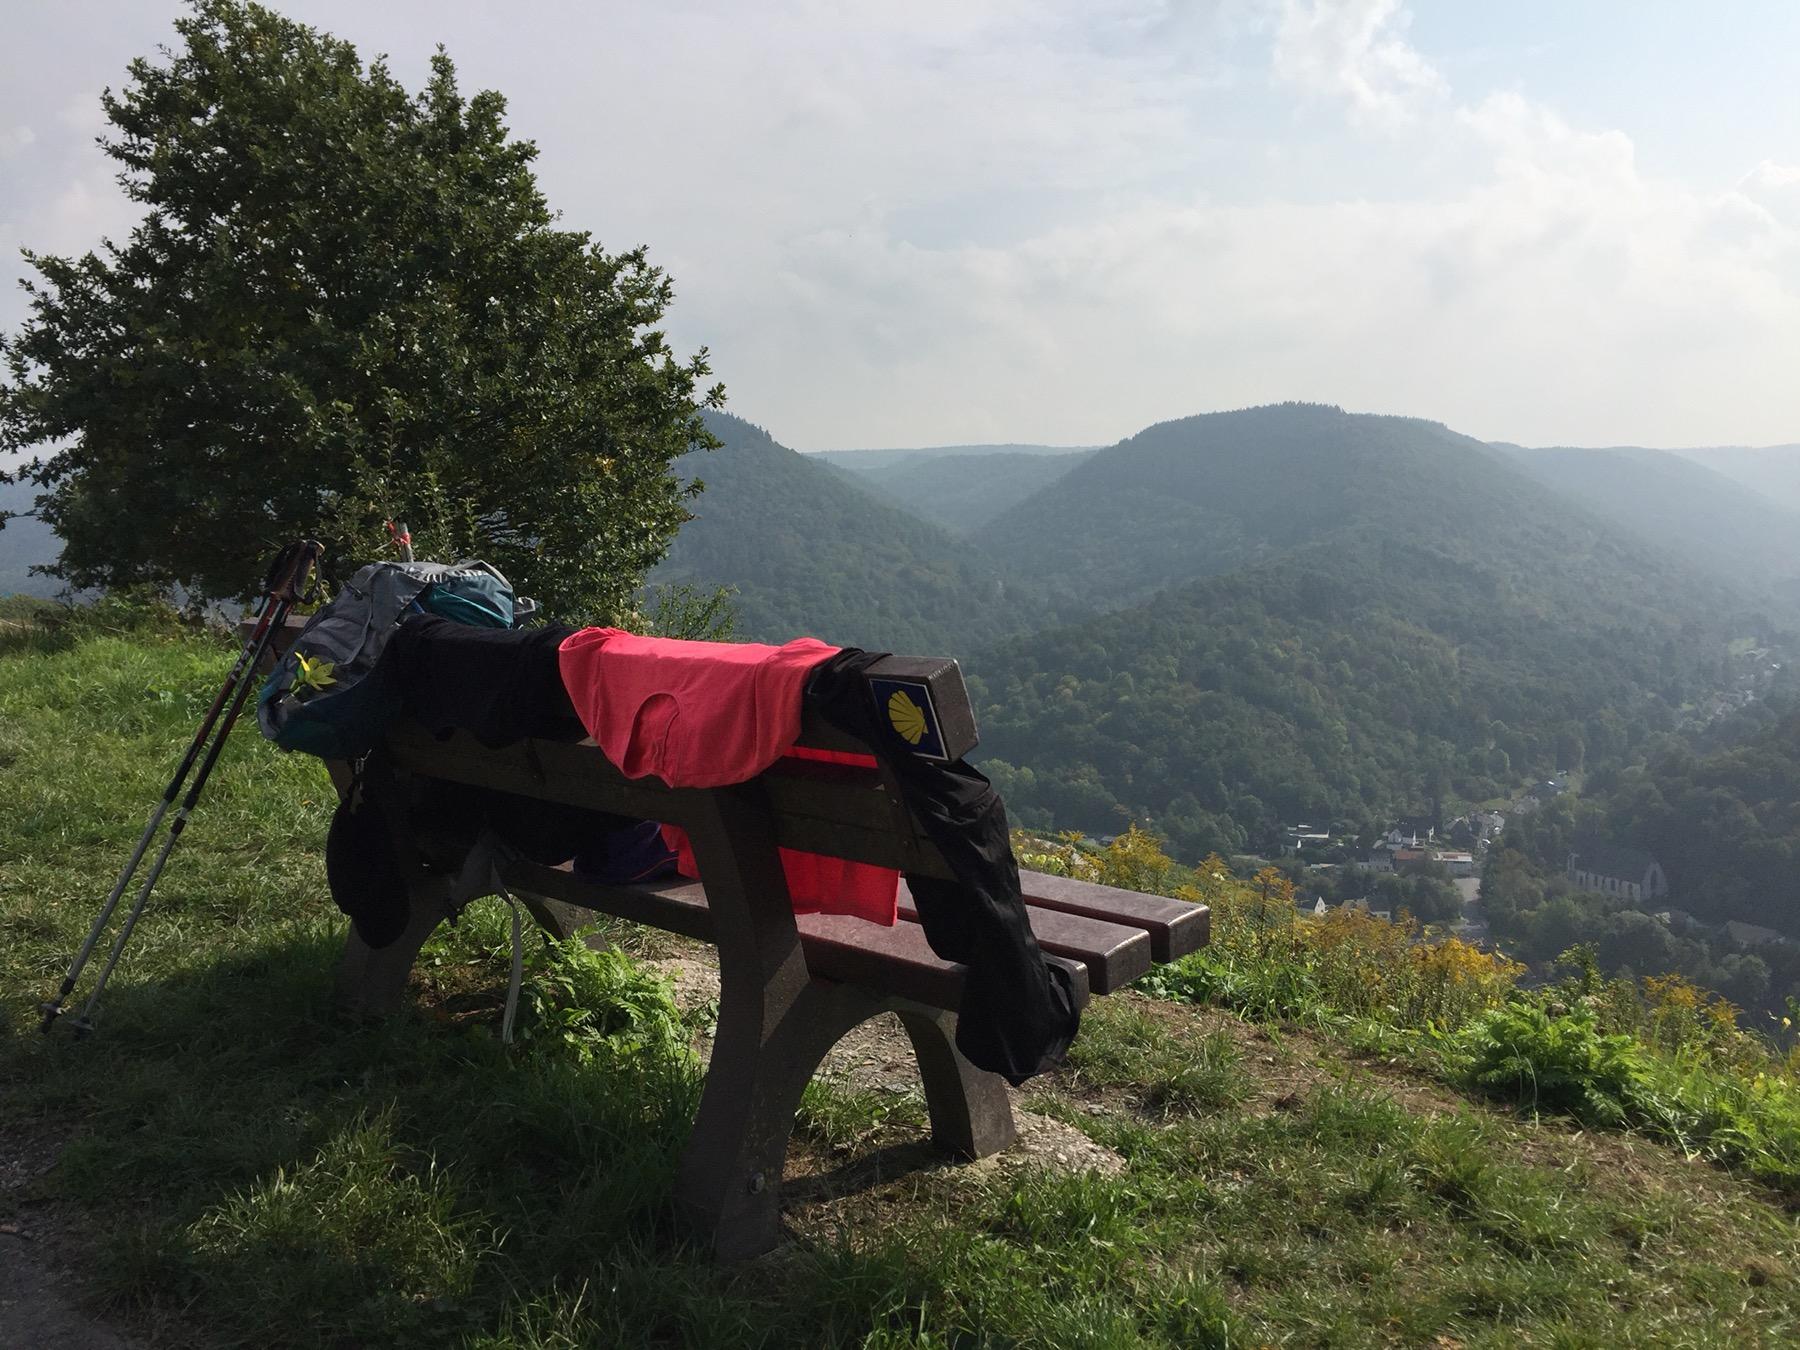 Wäschetrocknen am Mosel-Camino, Etappe 4 Marienburg - Traben-Trarbach